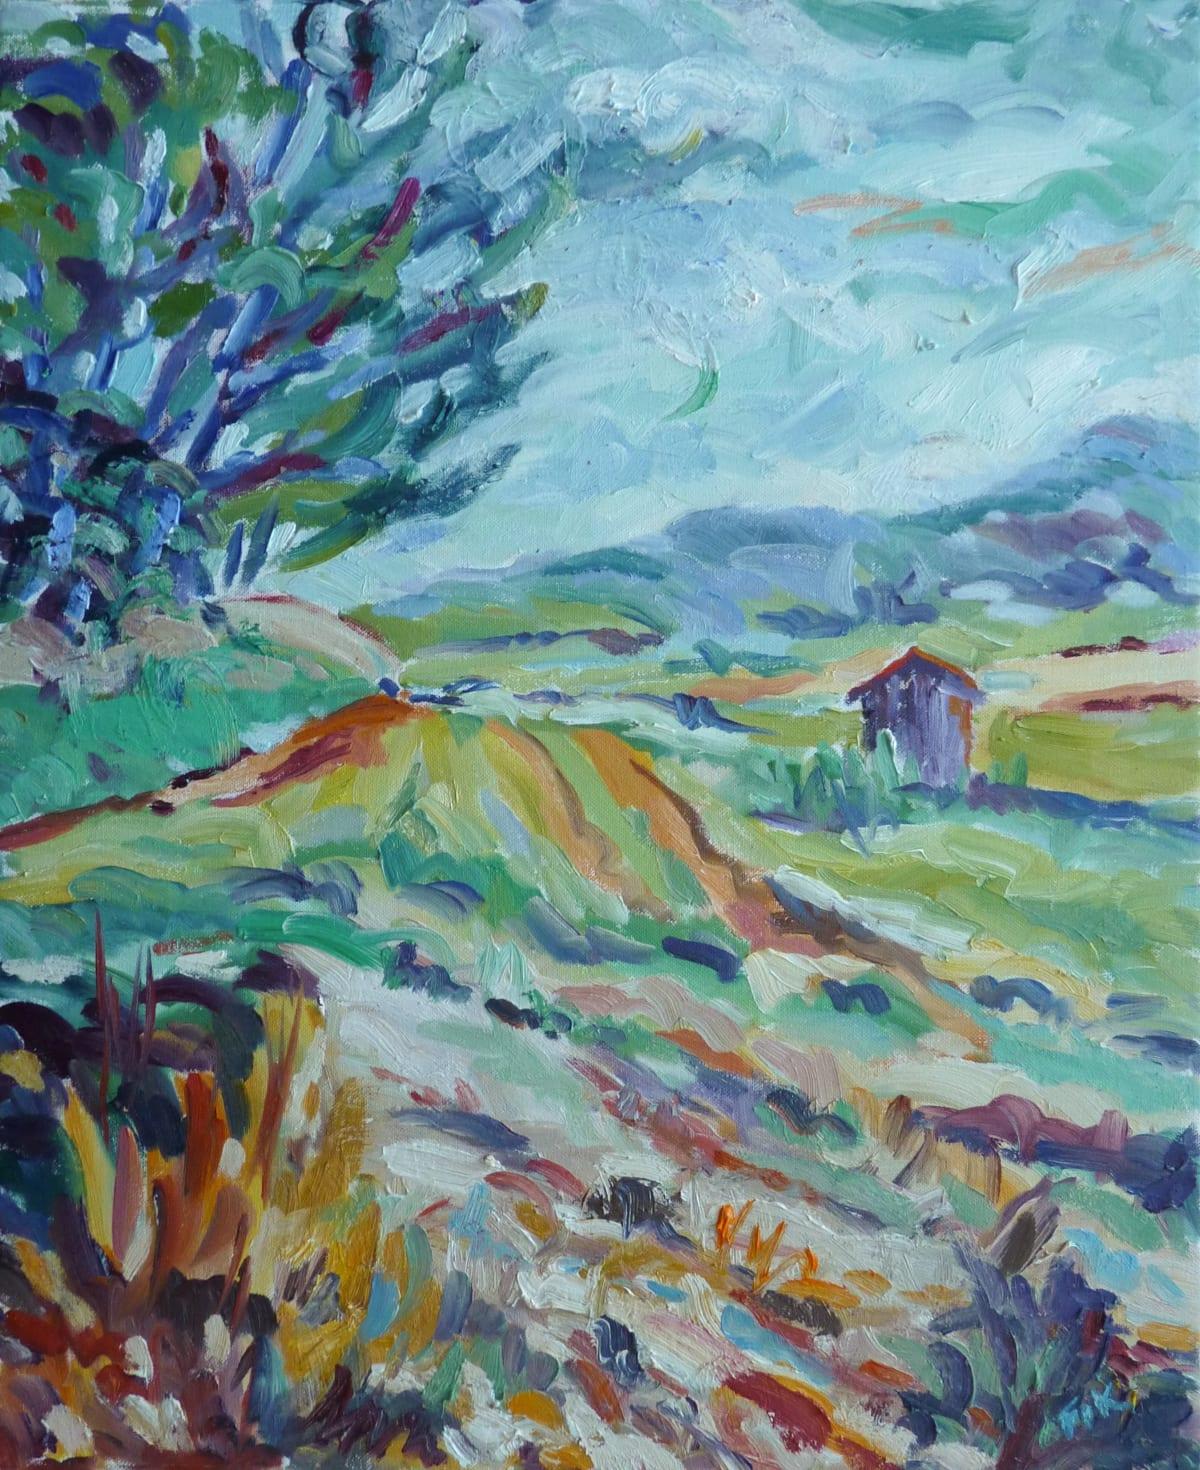 Fi Katzler MELON FIELDS AND CABANON Oil on canvas board 24 x 20 in. 60.96 x 50.8 cm